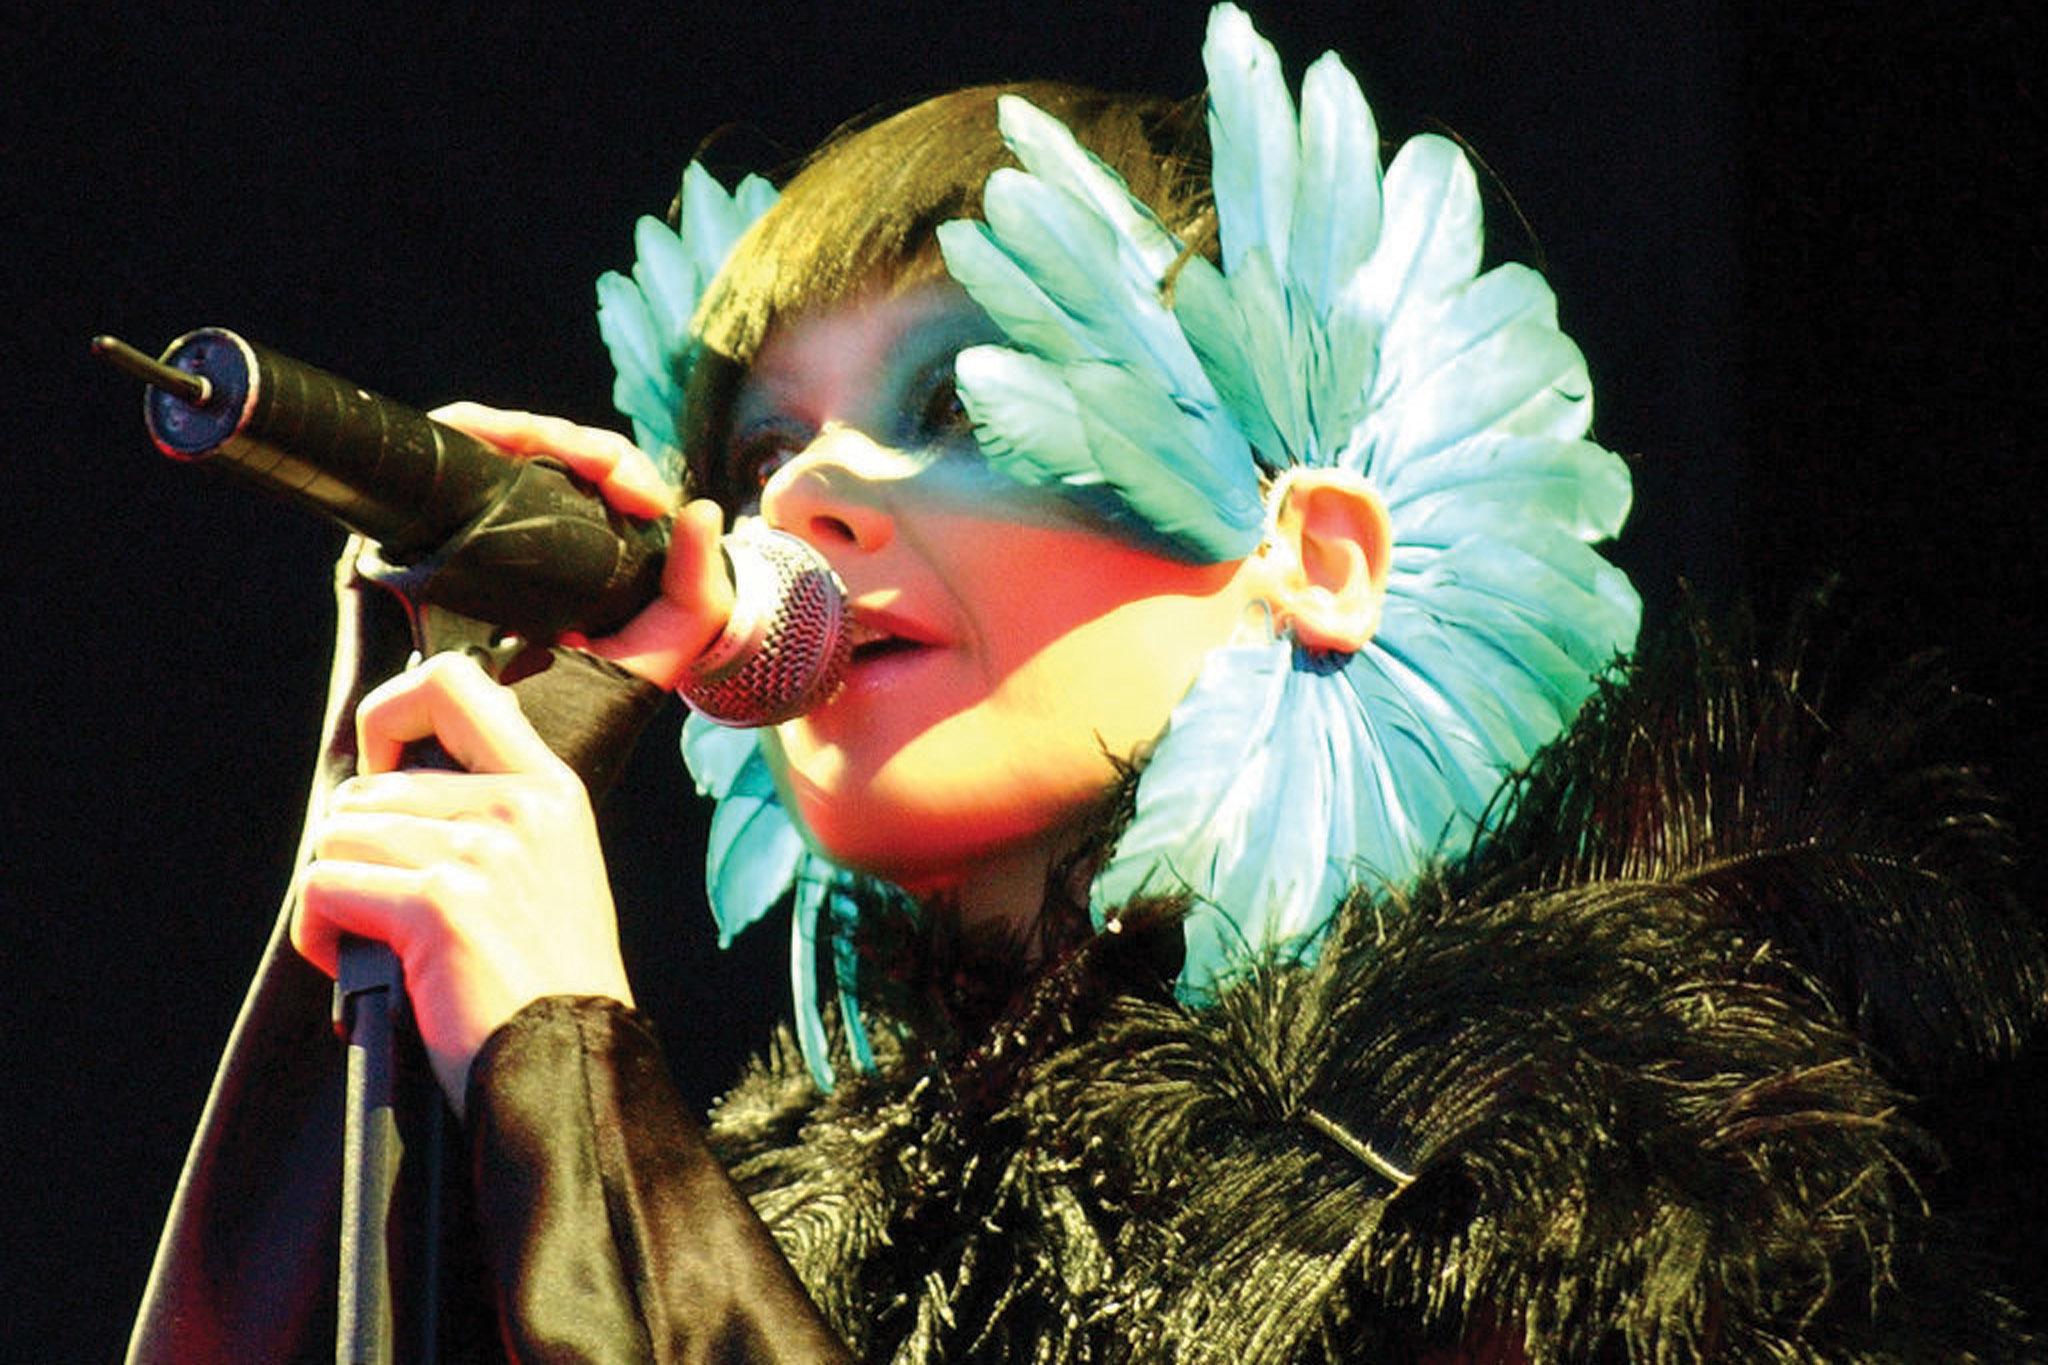 Björk shows!